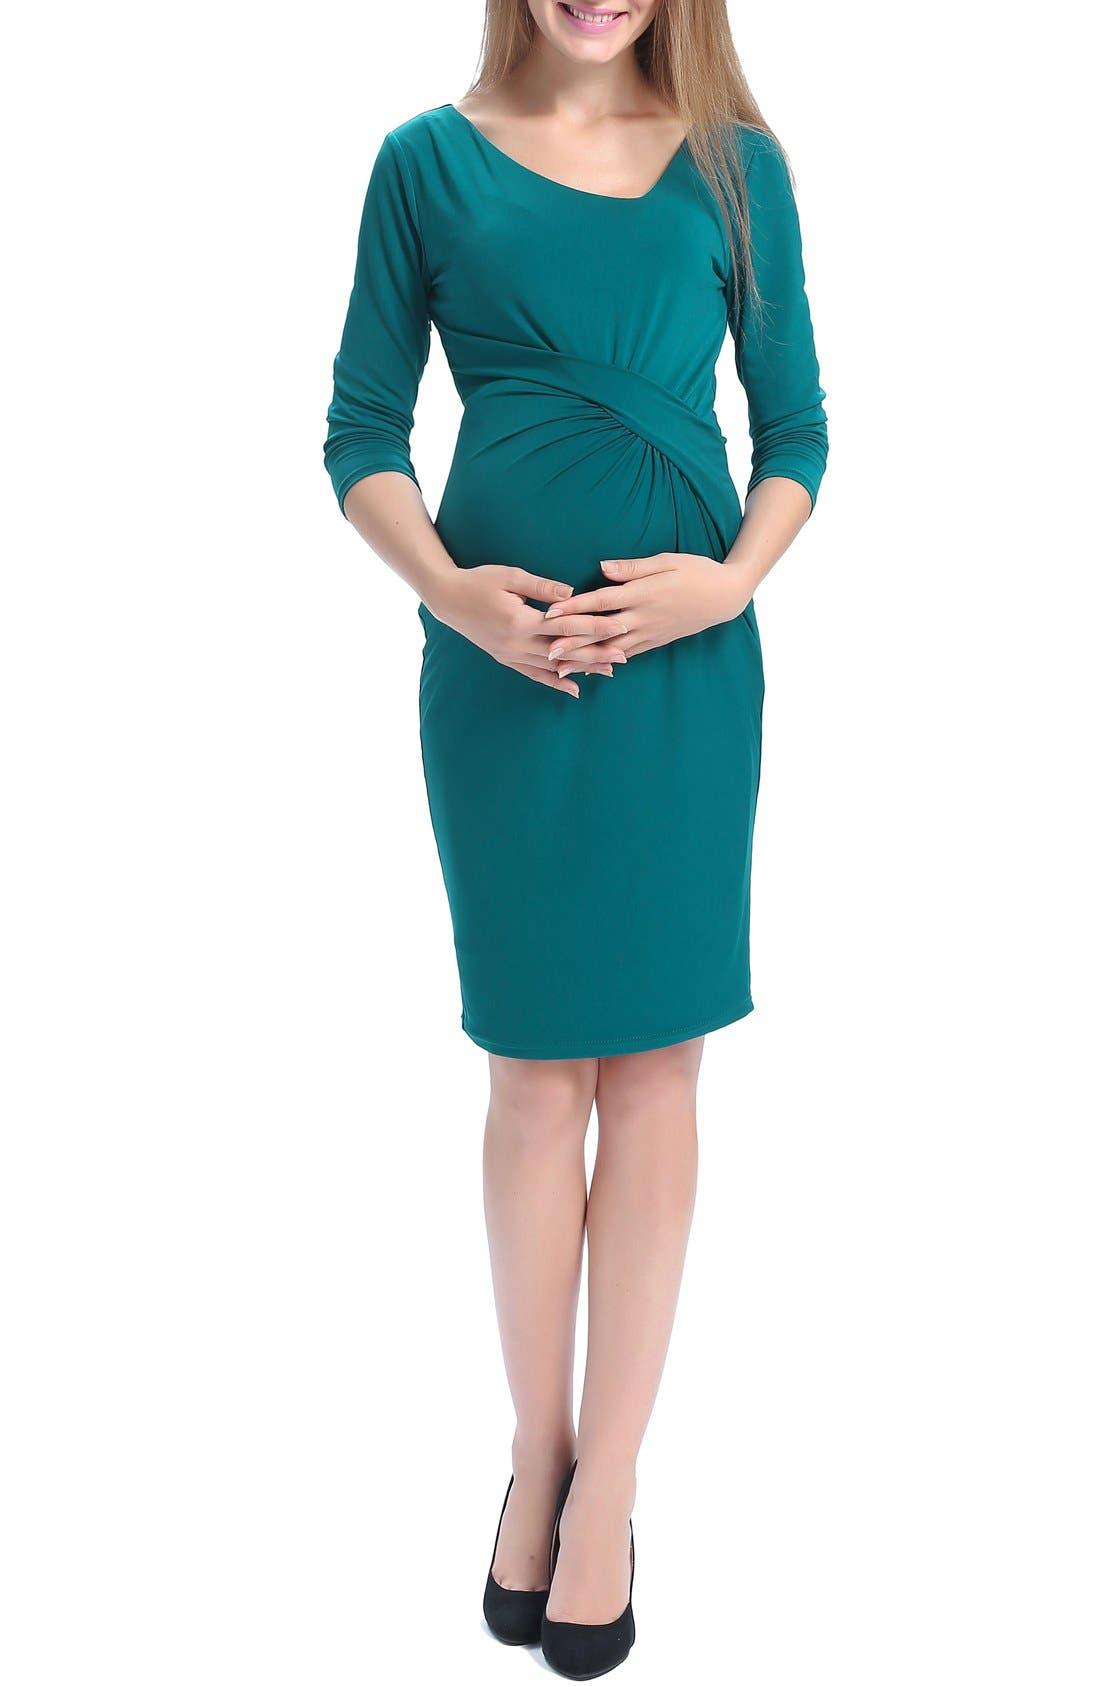 Alternate Image 1 Selected - Kimi and Kai Teagan Body-Con Maternity Dress